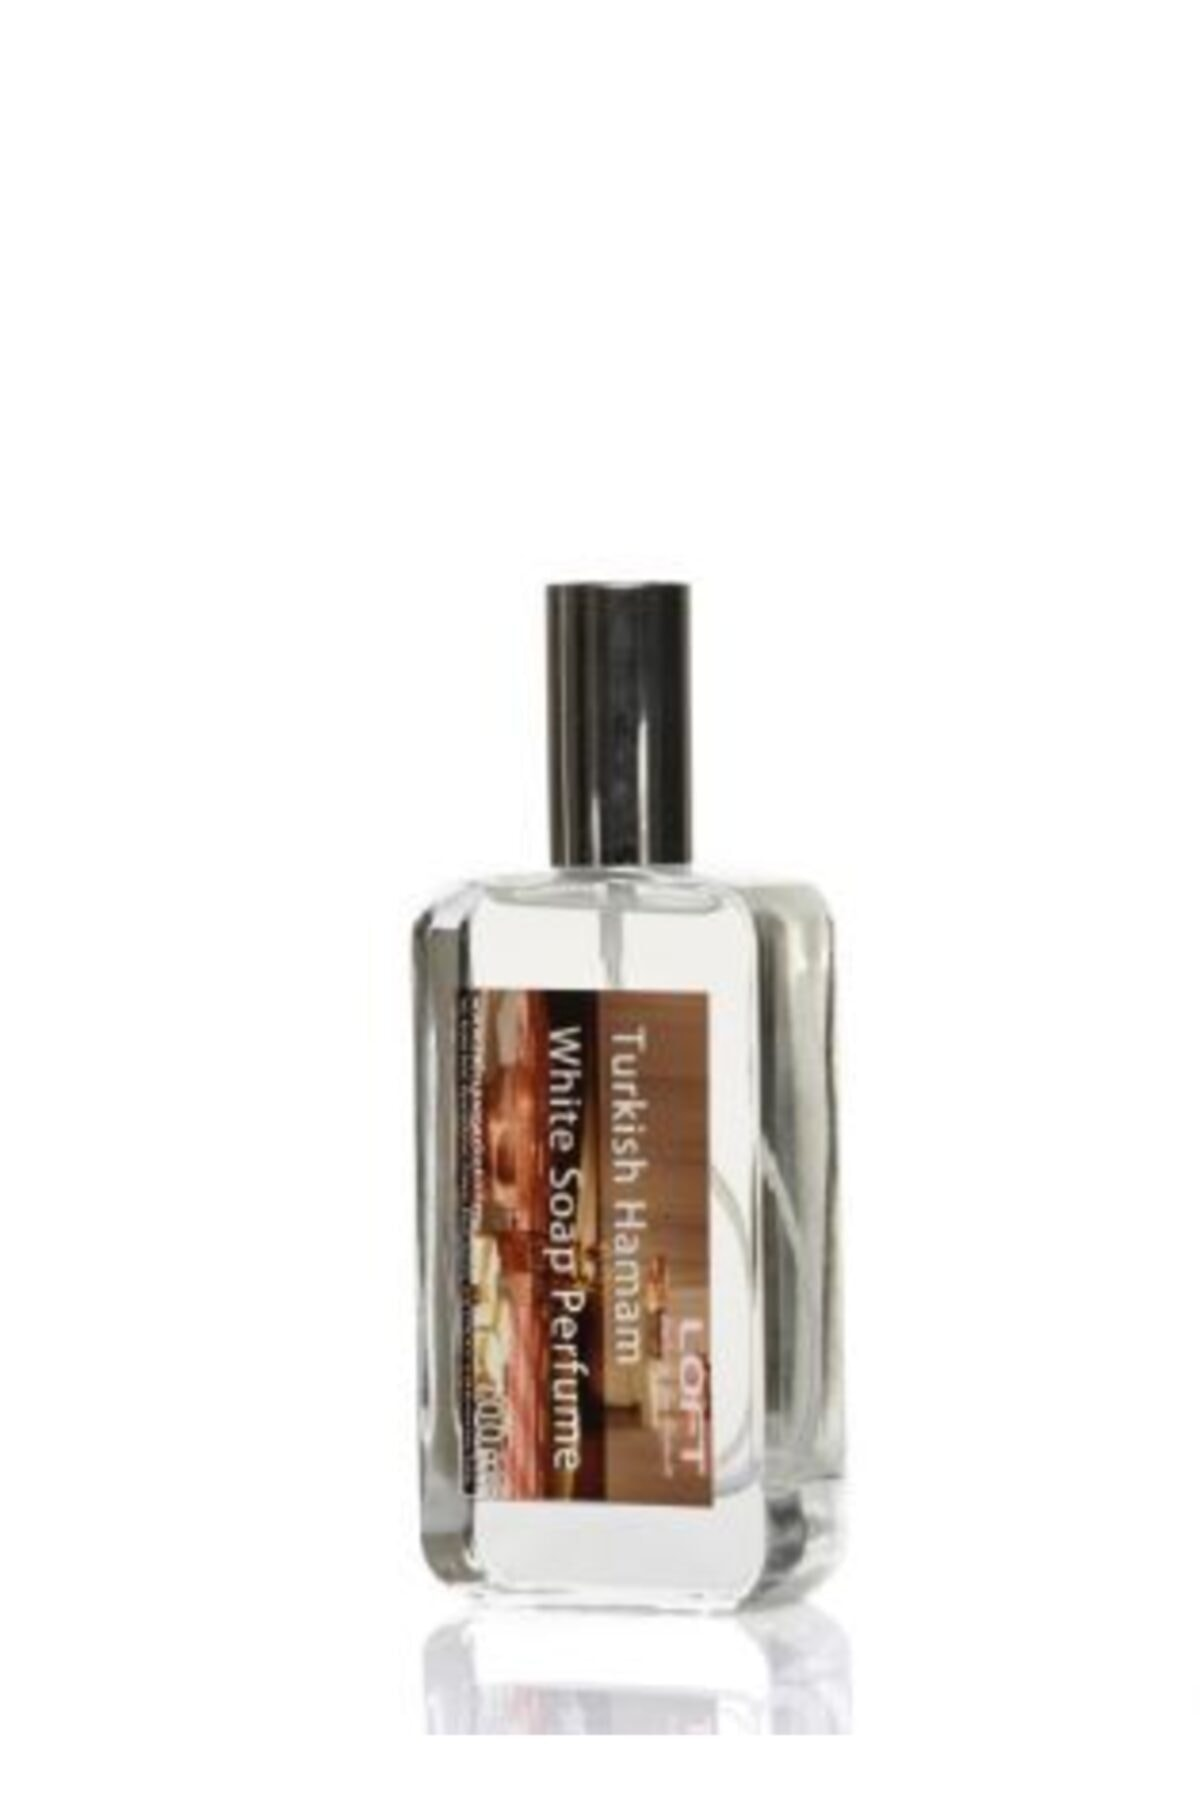 Loft EDP 30 ml Unisex Parfüm 9798897987489489 1